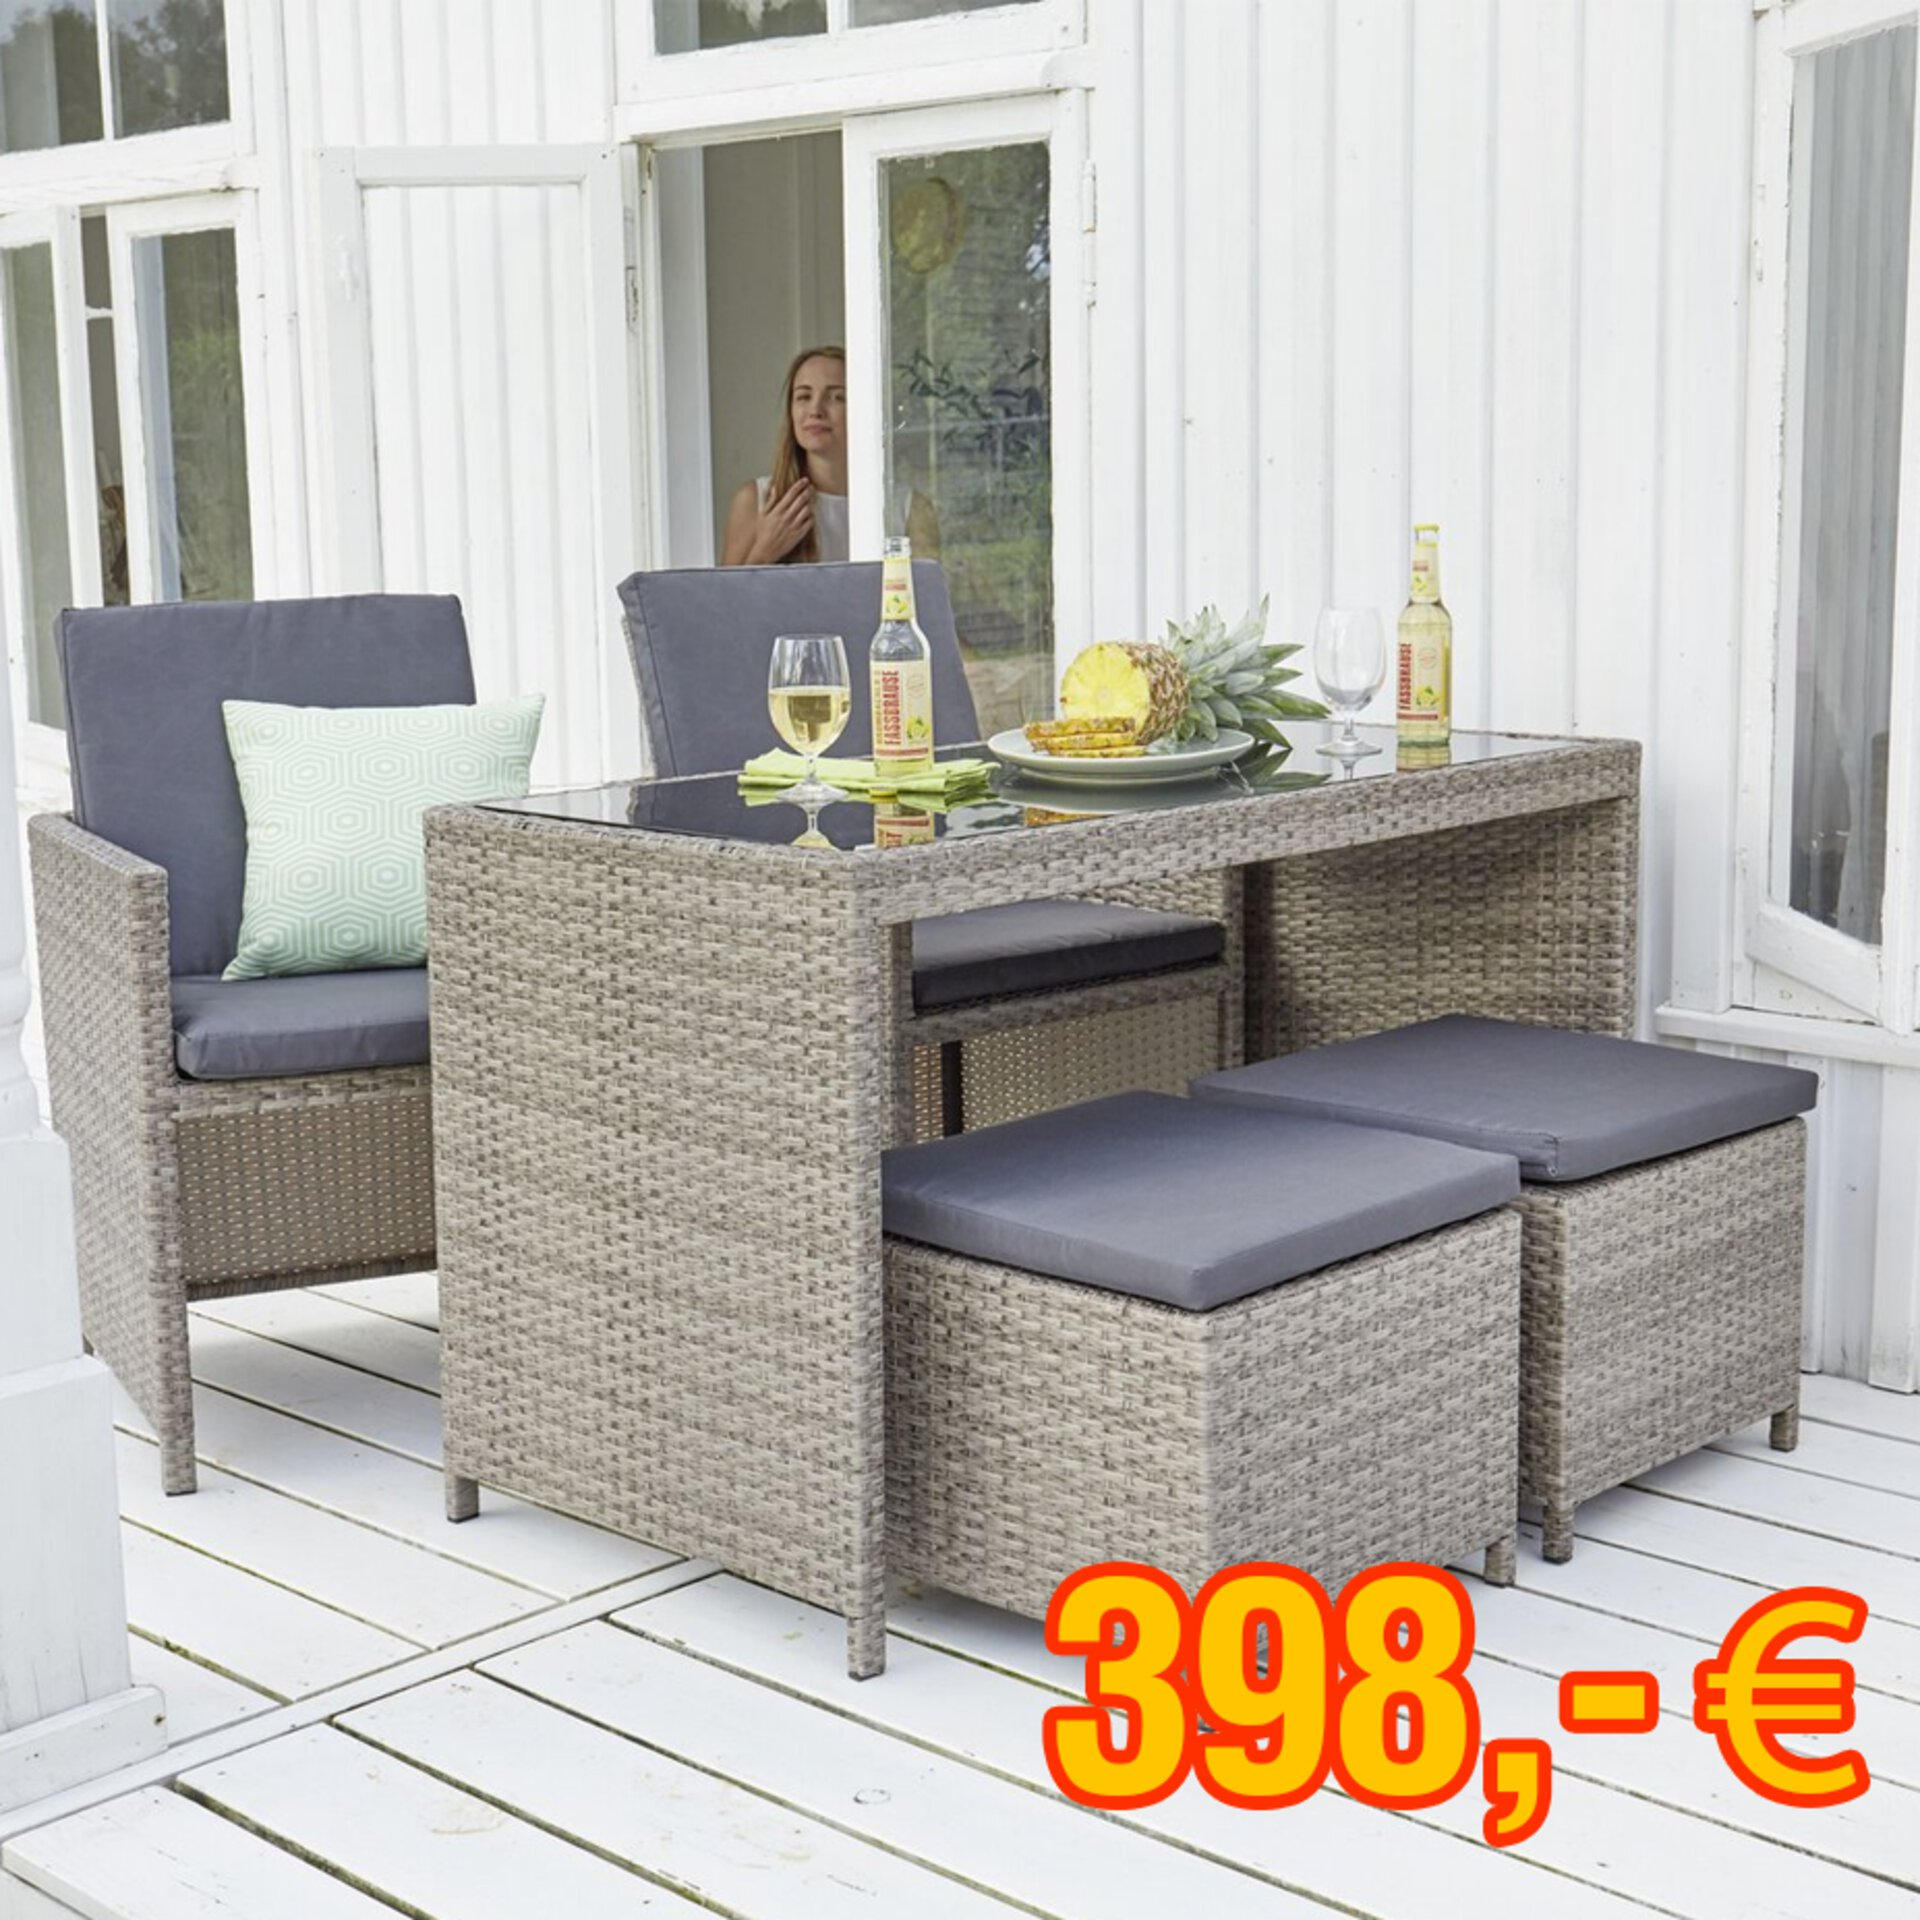 Kompaktes Loungemöbel-Set für 398 €